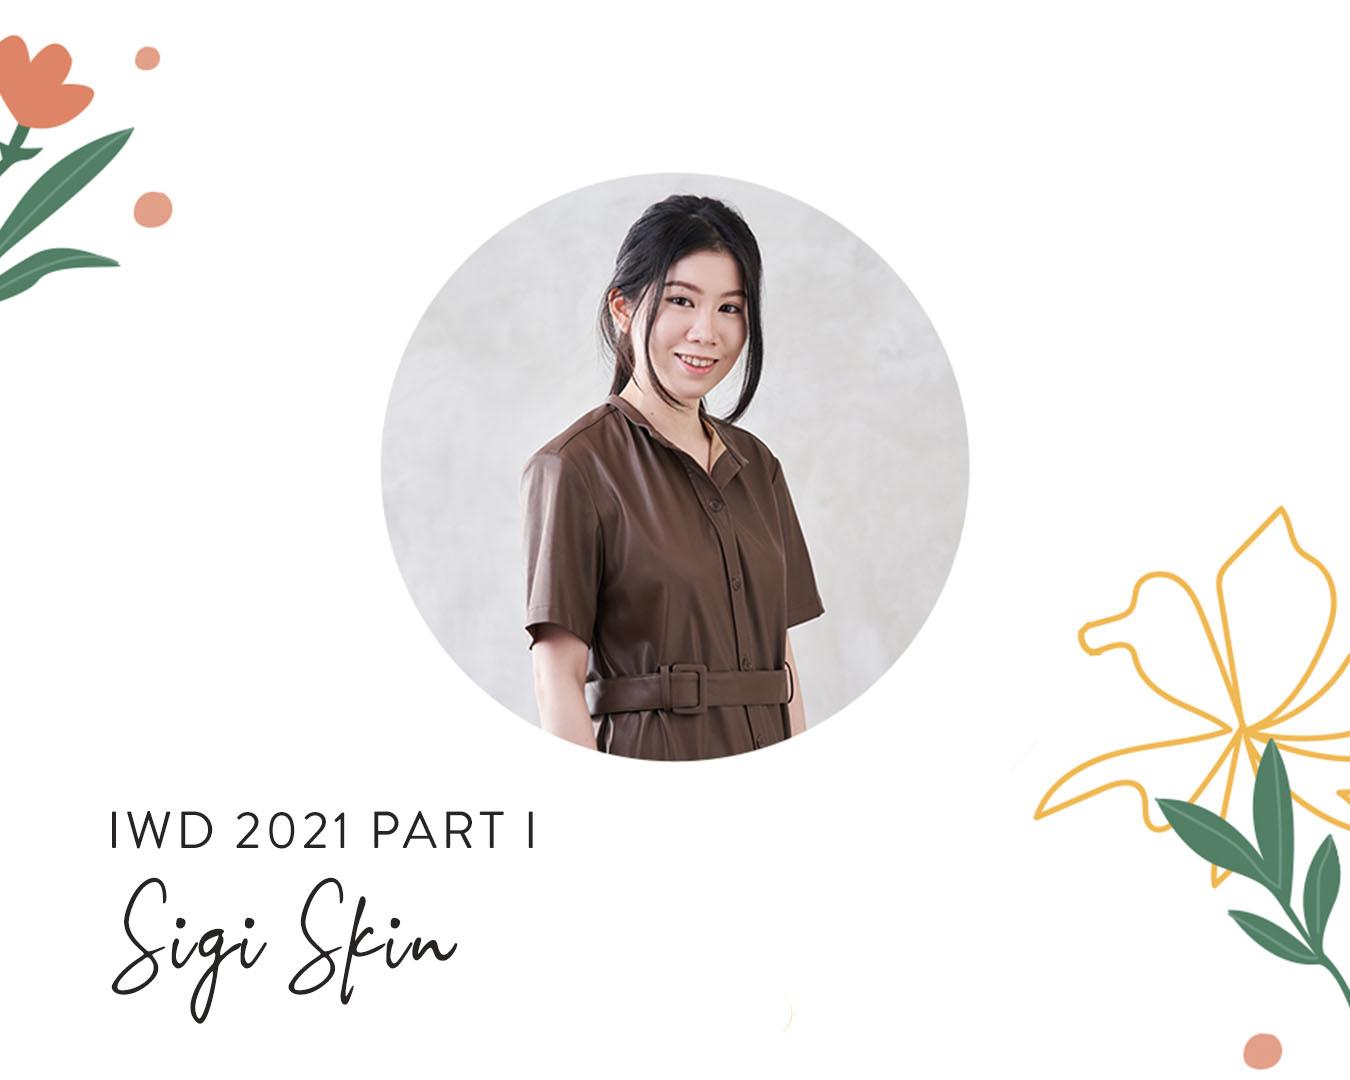 IWD 2021 Part I: Sigi Skin